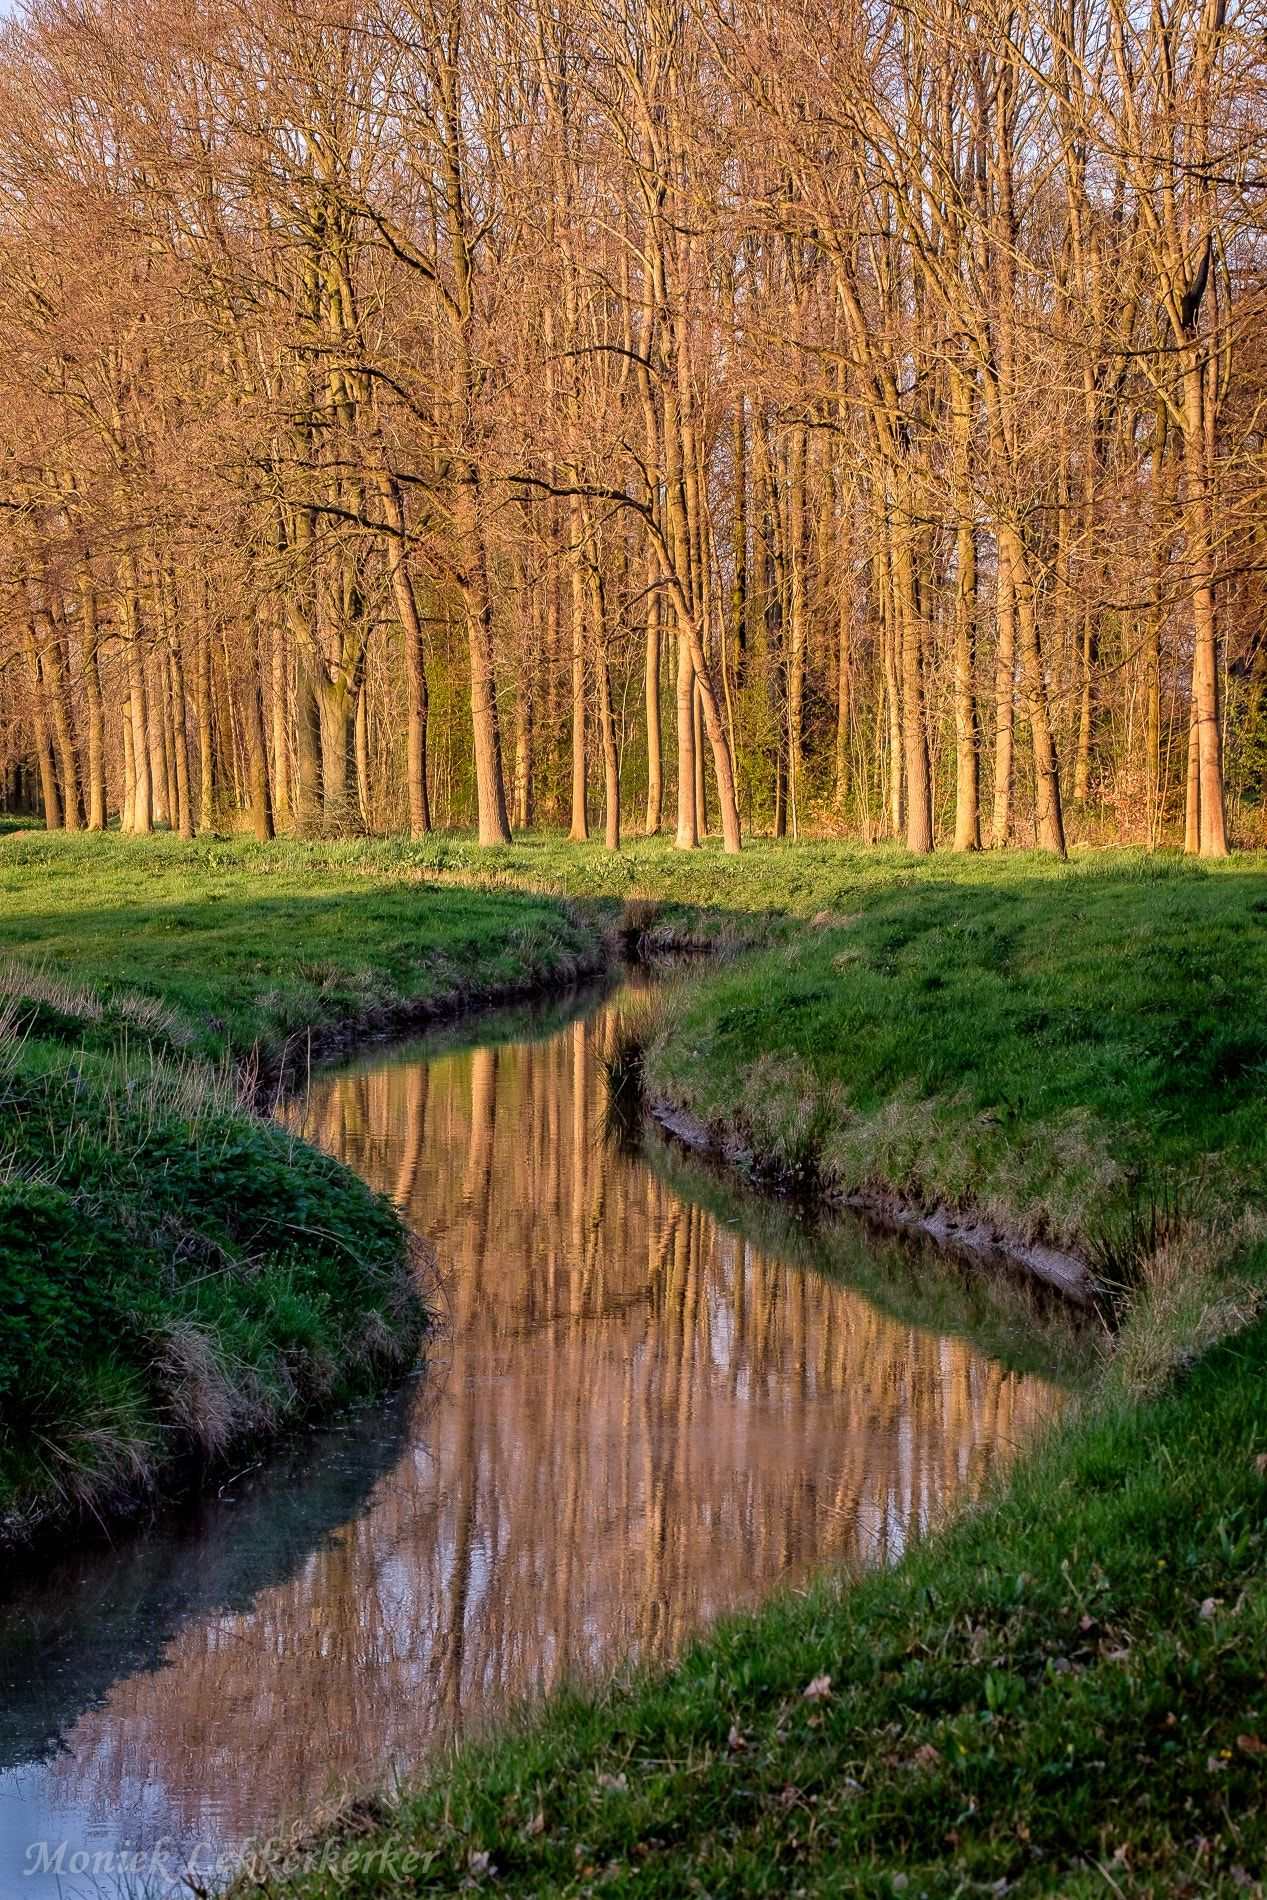 Little Limburg, Haarzuilens - One night i did a little walk of 1.7 km. We saw beautiful landscapes bij a beautiful sunset.